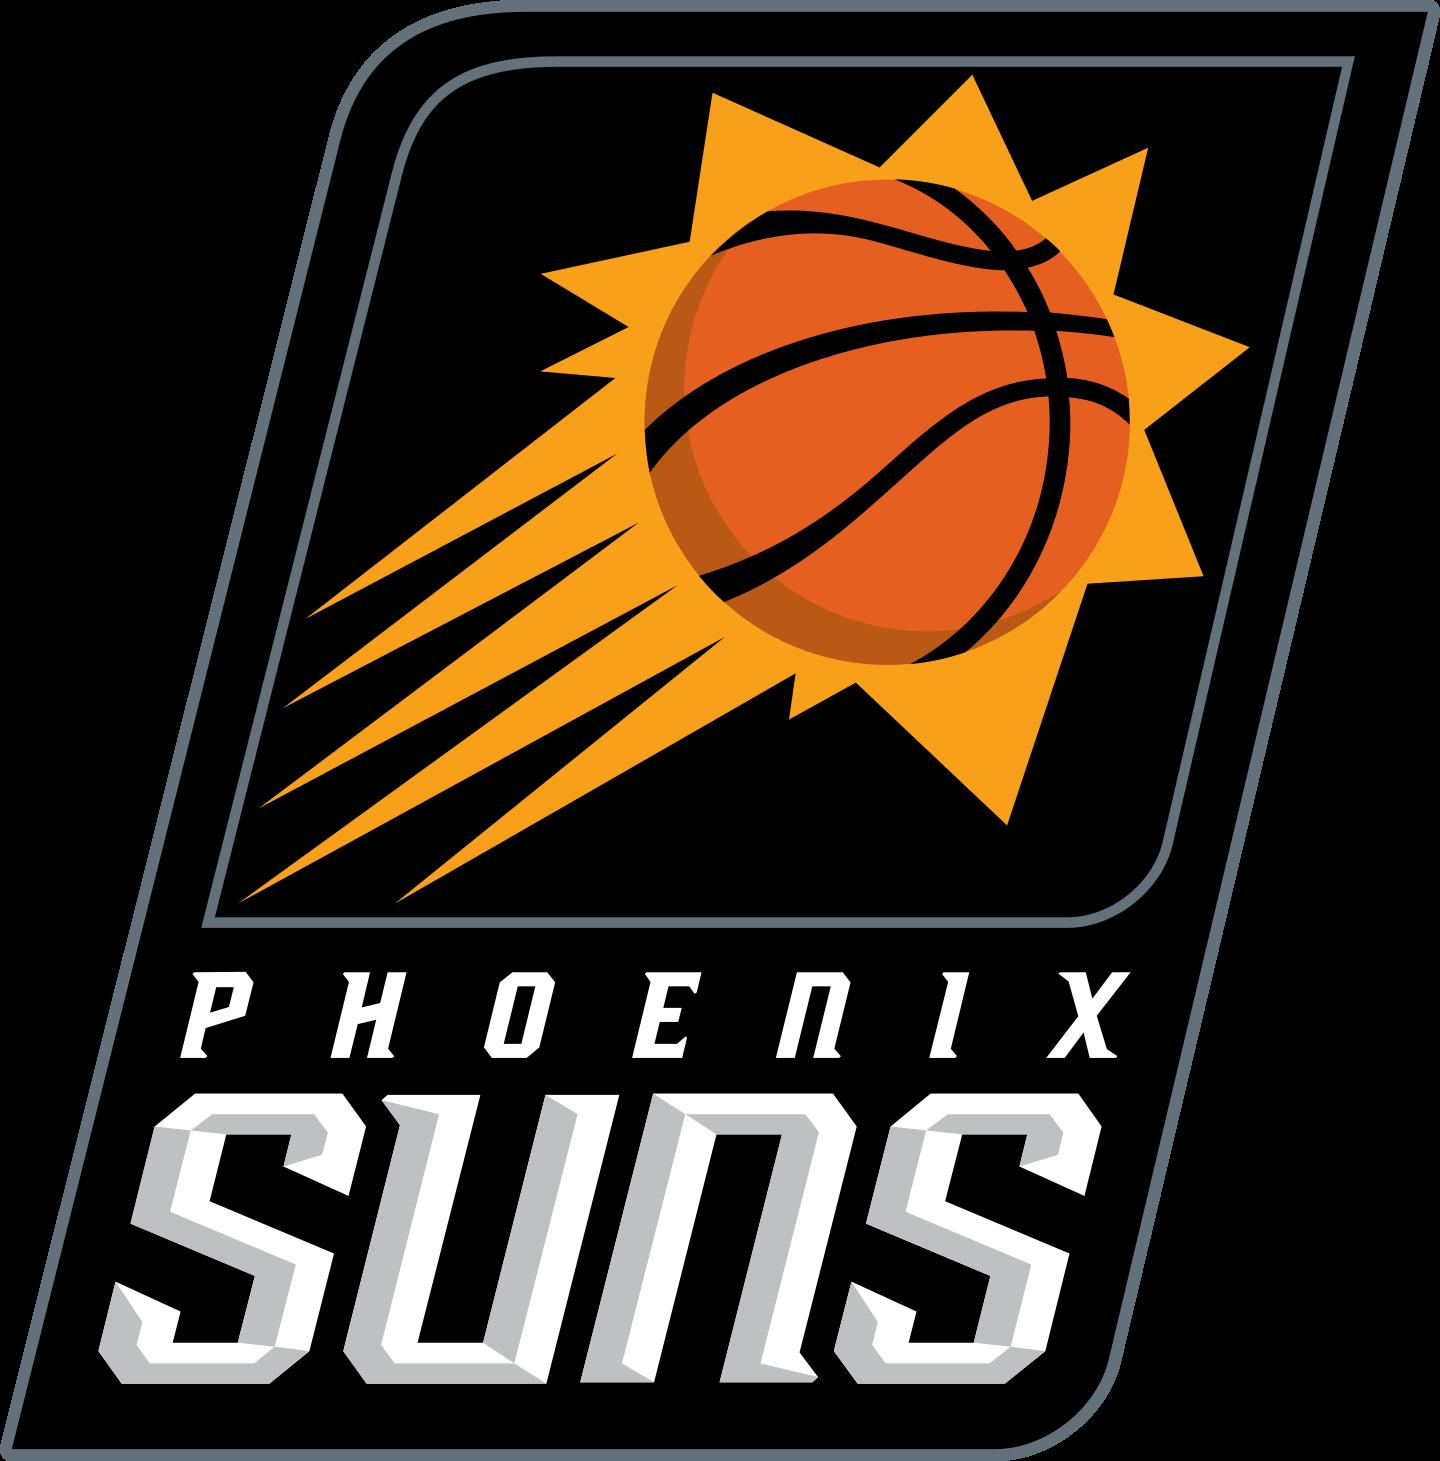 phoenix suns logo 2 - Phoenix Suns Logo